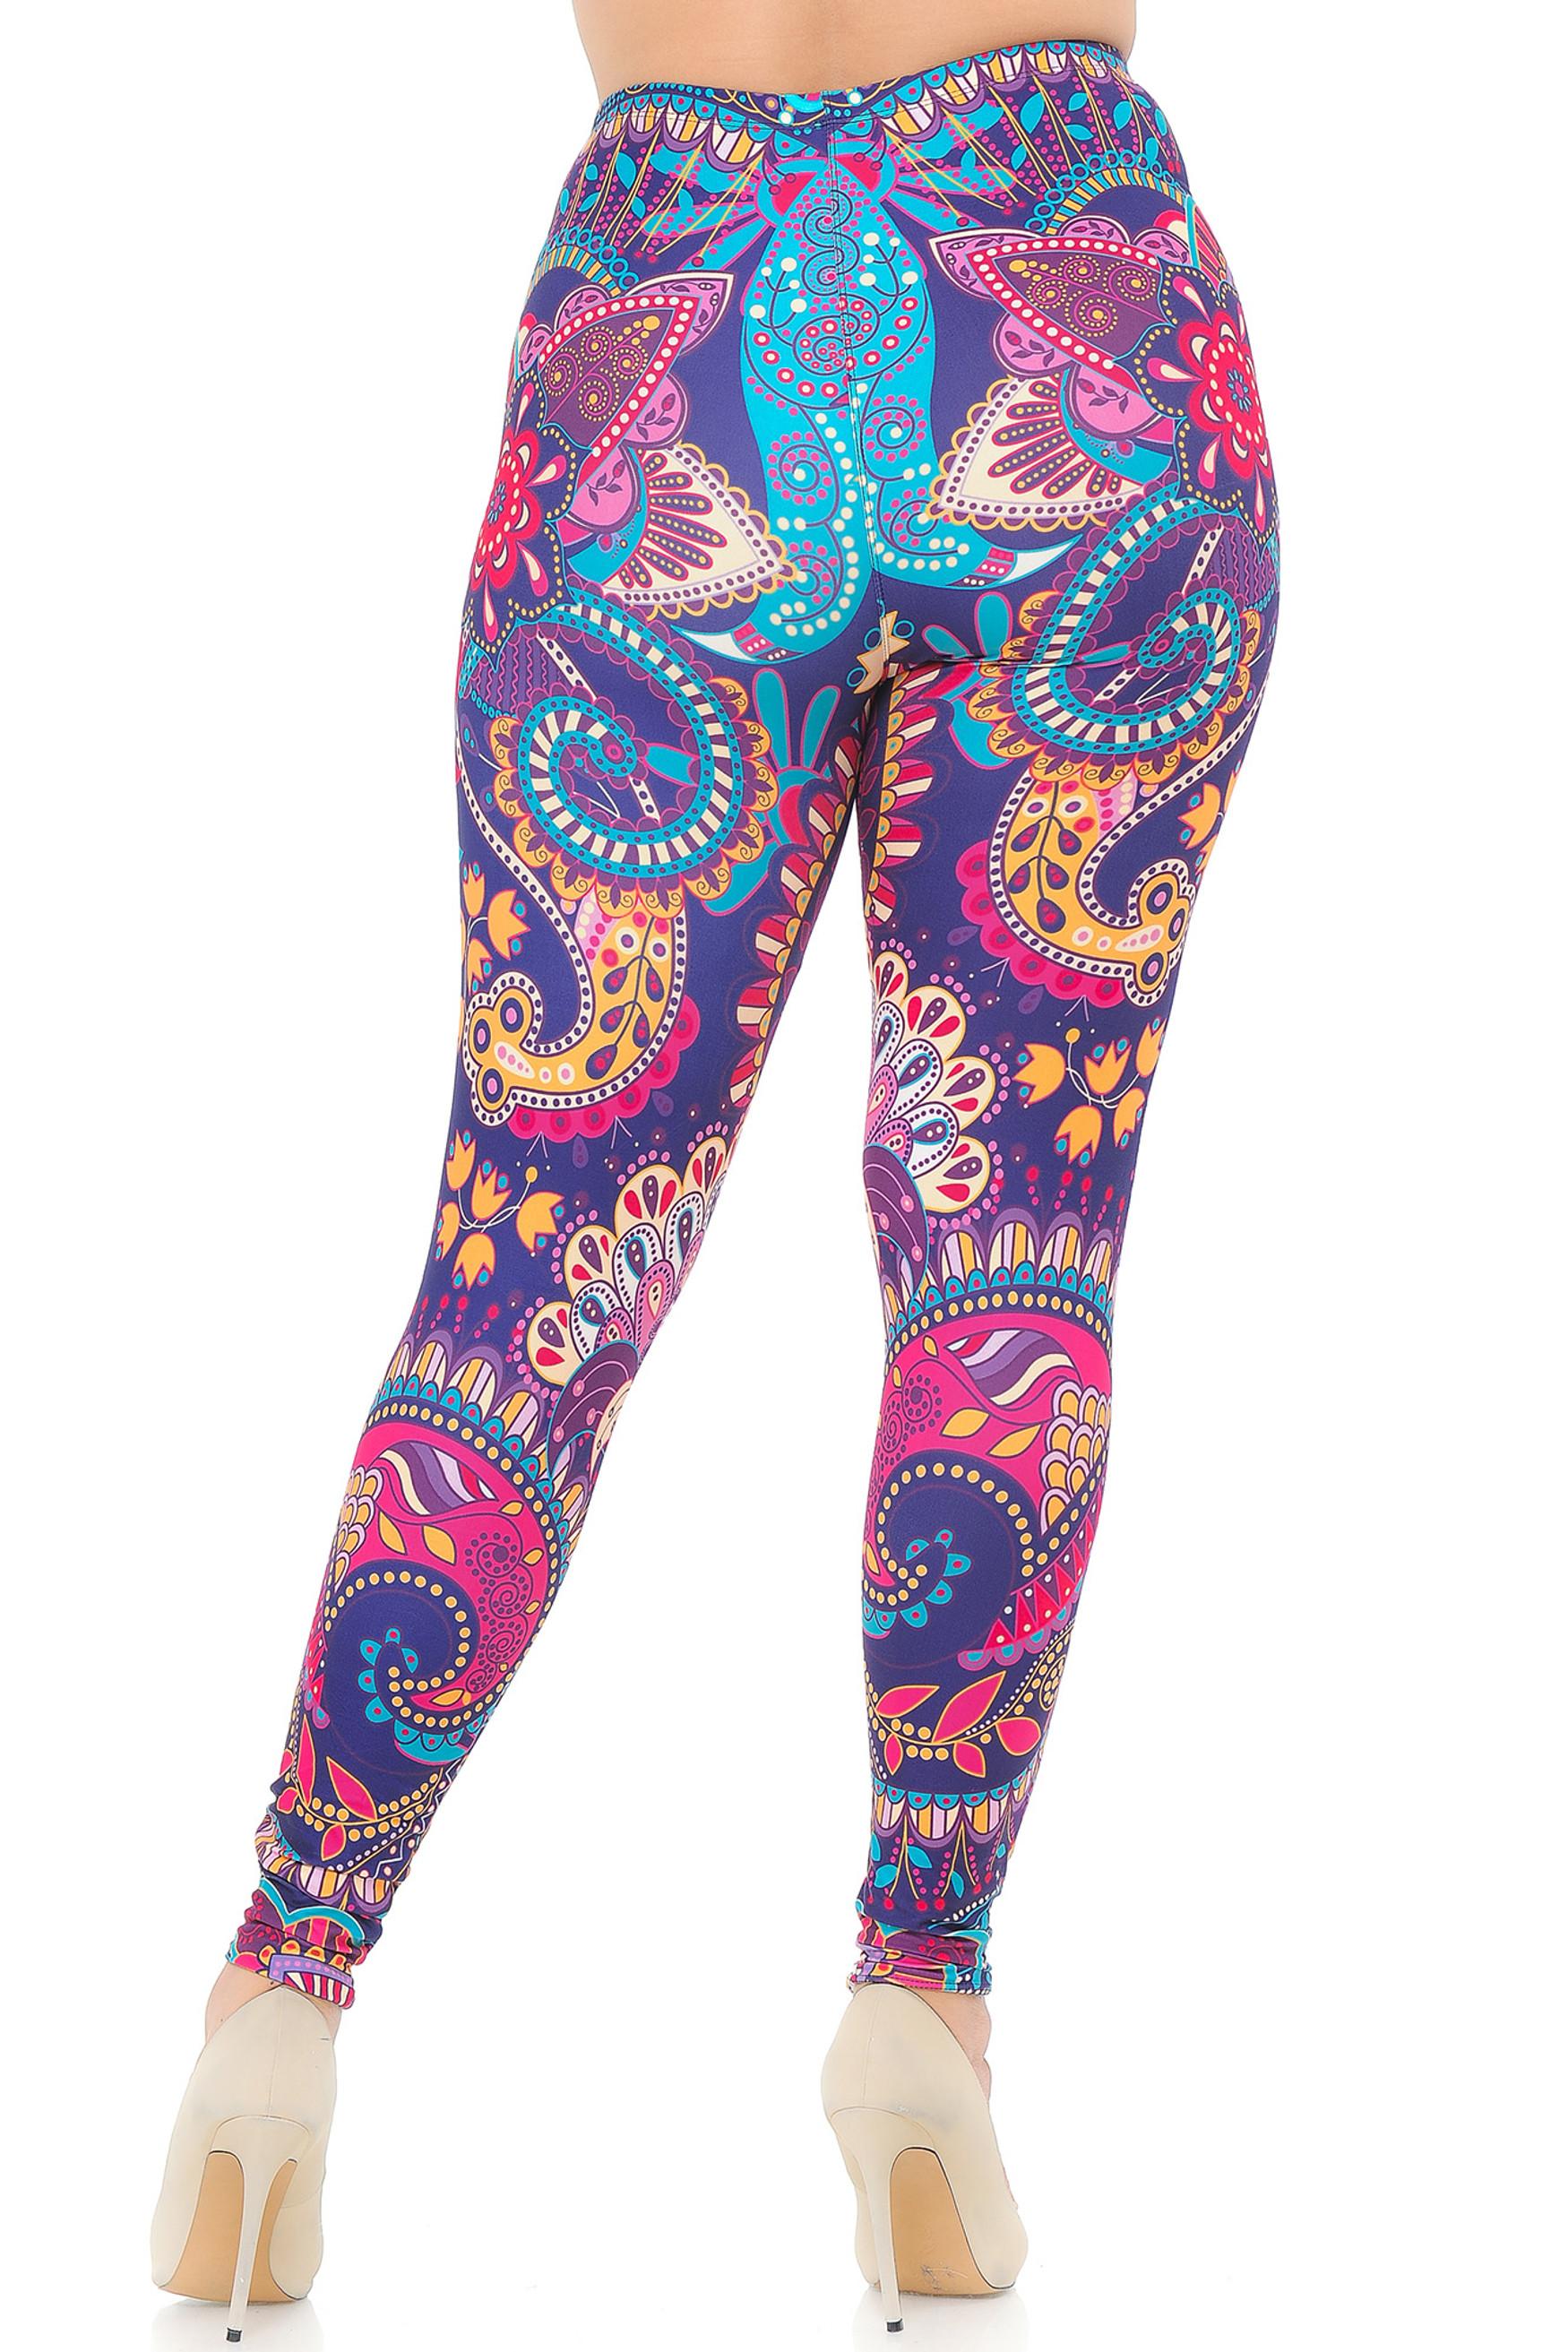 Creamy Soft Mandala Flowers Plus Size Leggings - USA Fashion™